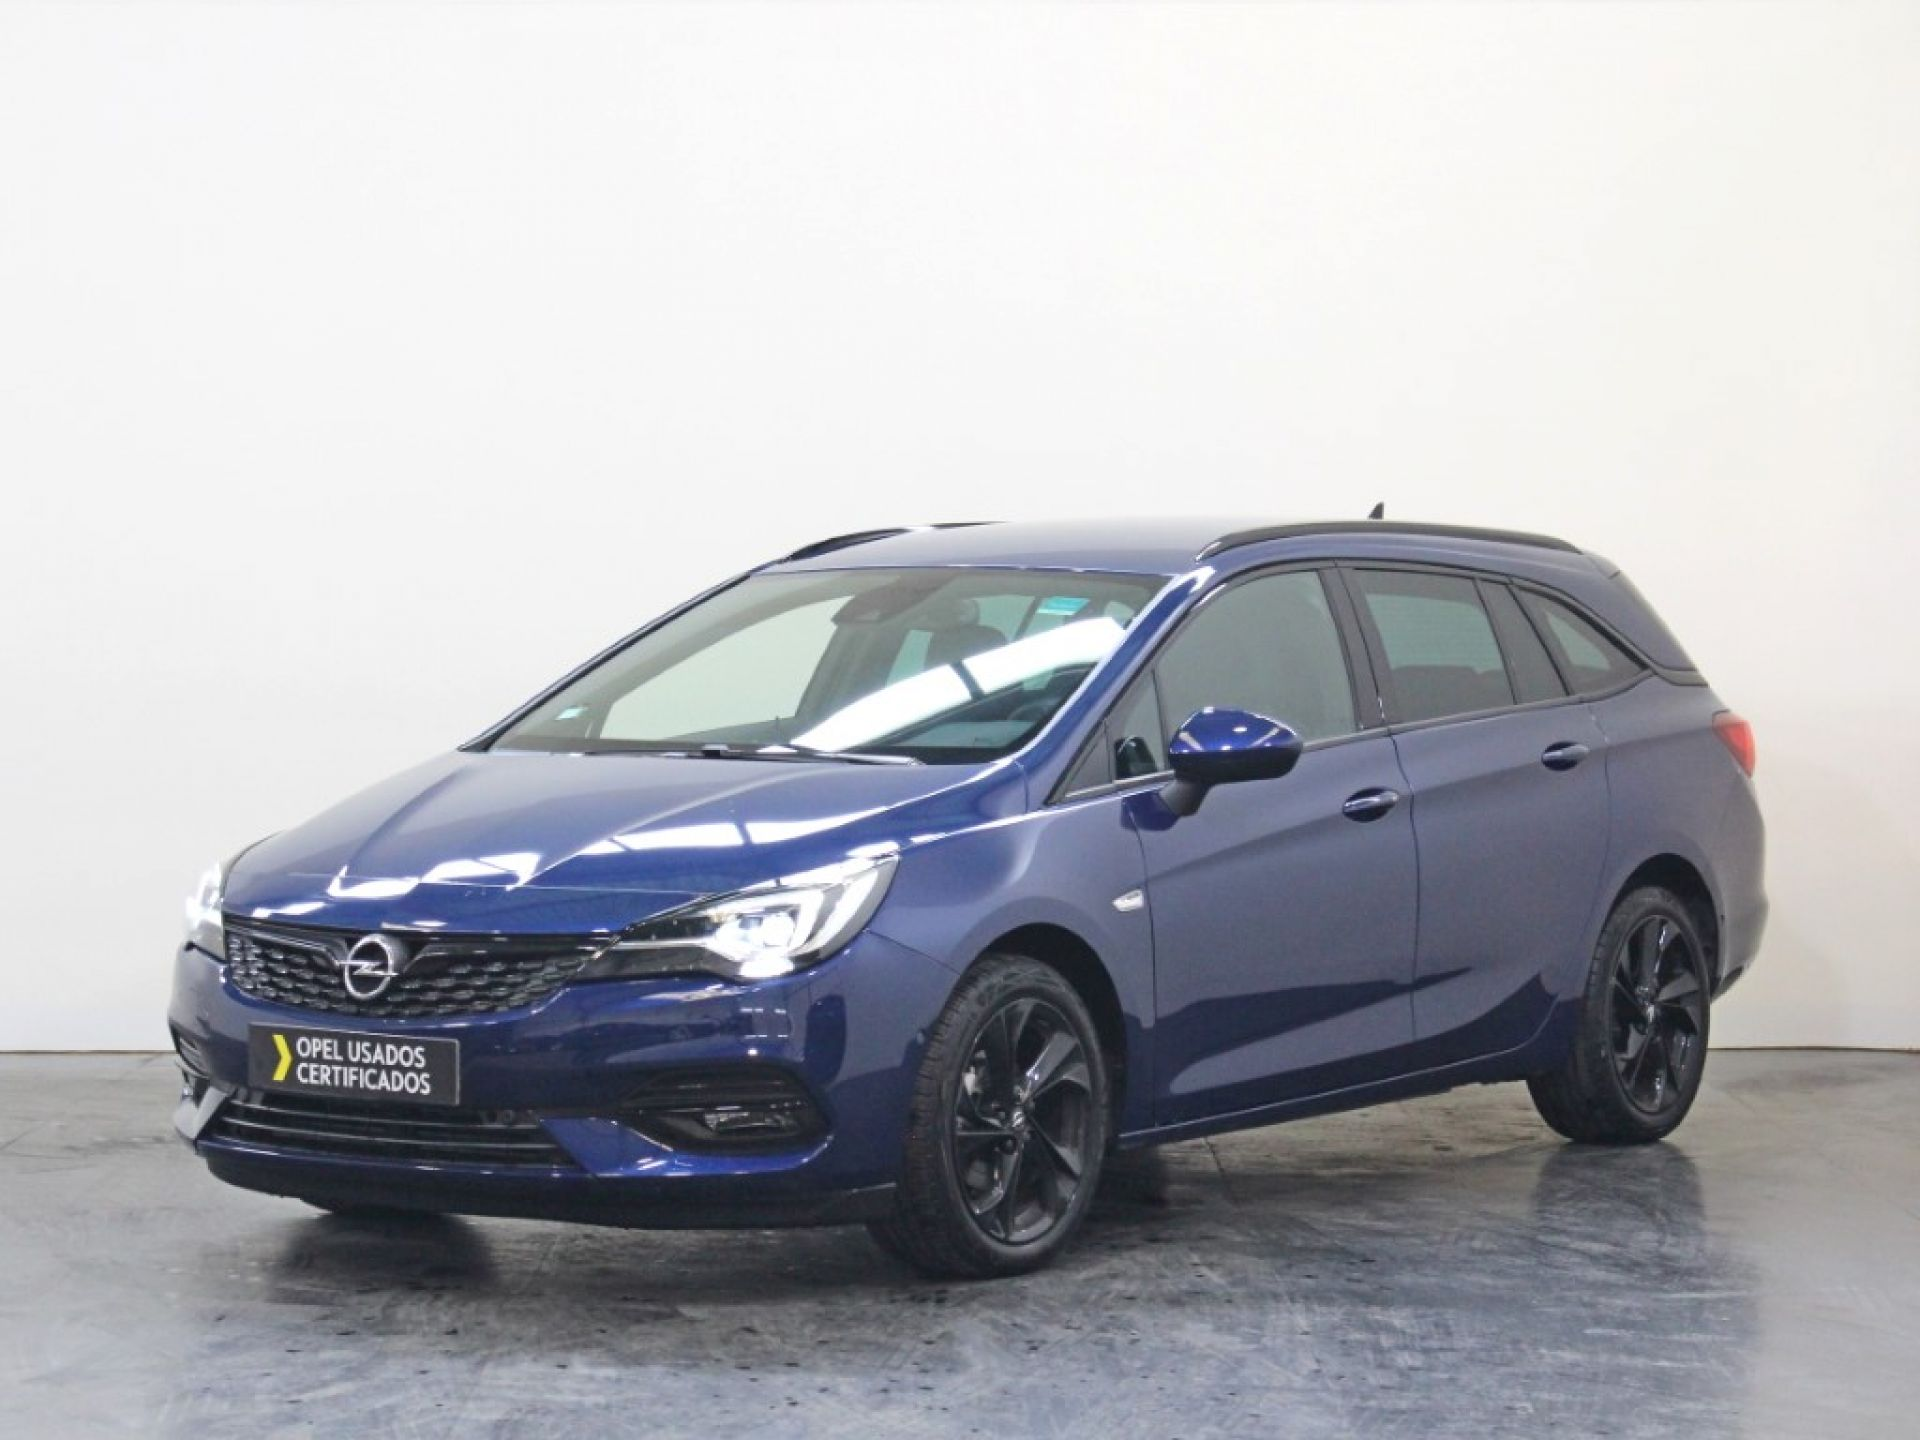 Opel Astra 1.5 Turbo D 122cv Ultimate ST usada Porto